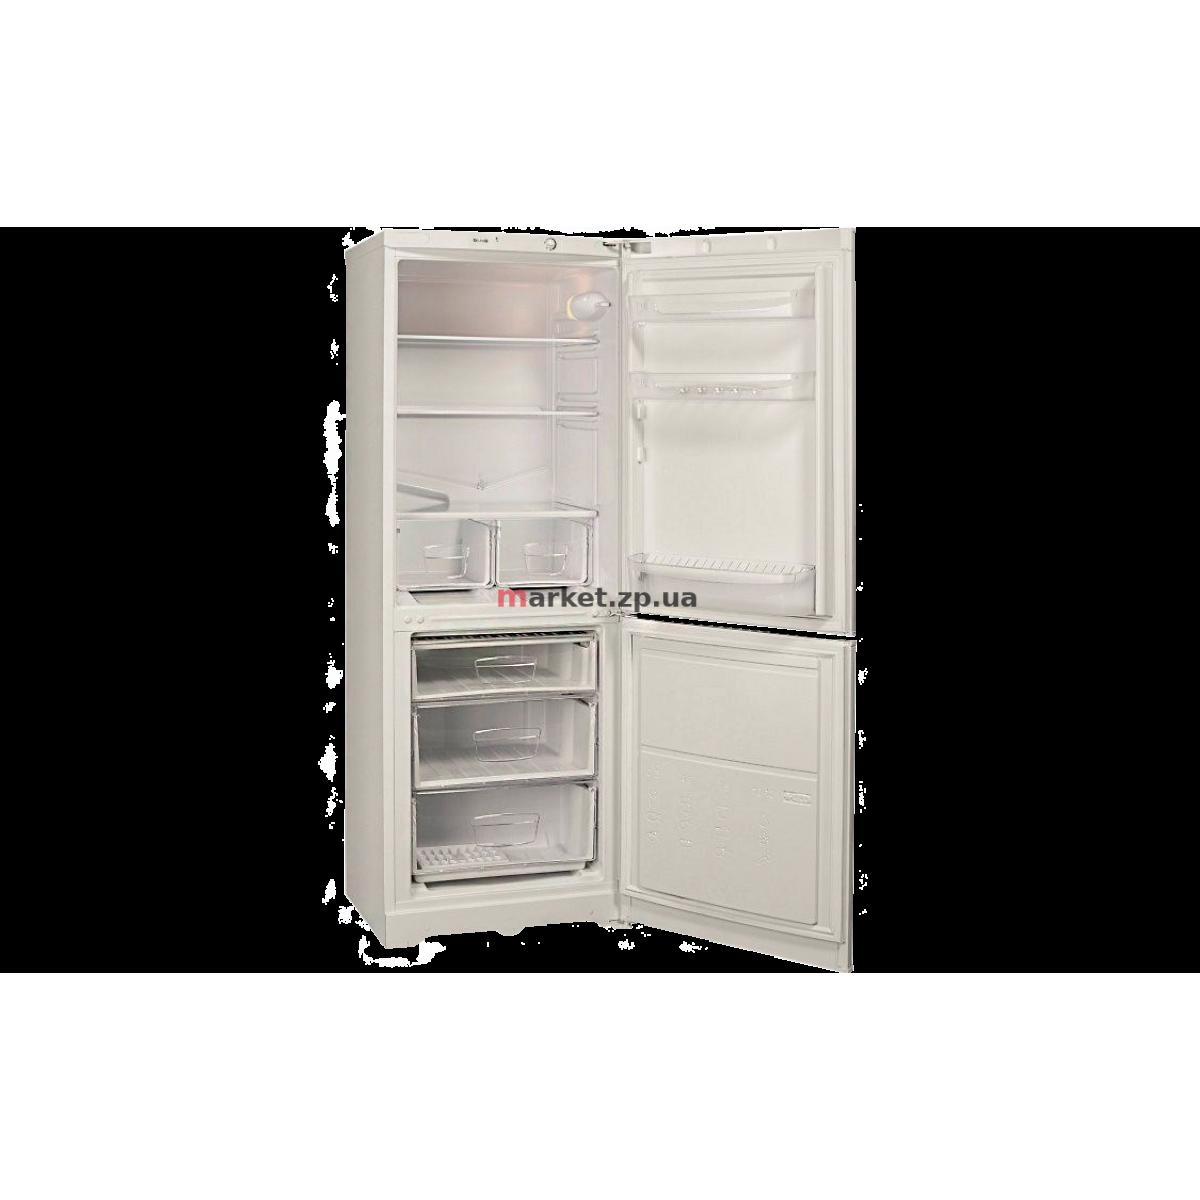 Холодильник INDESIT IBS 16 AА